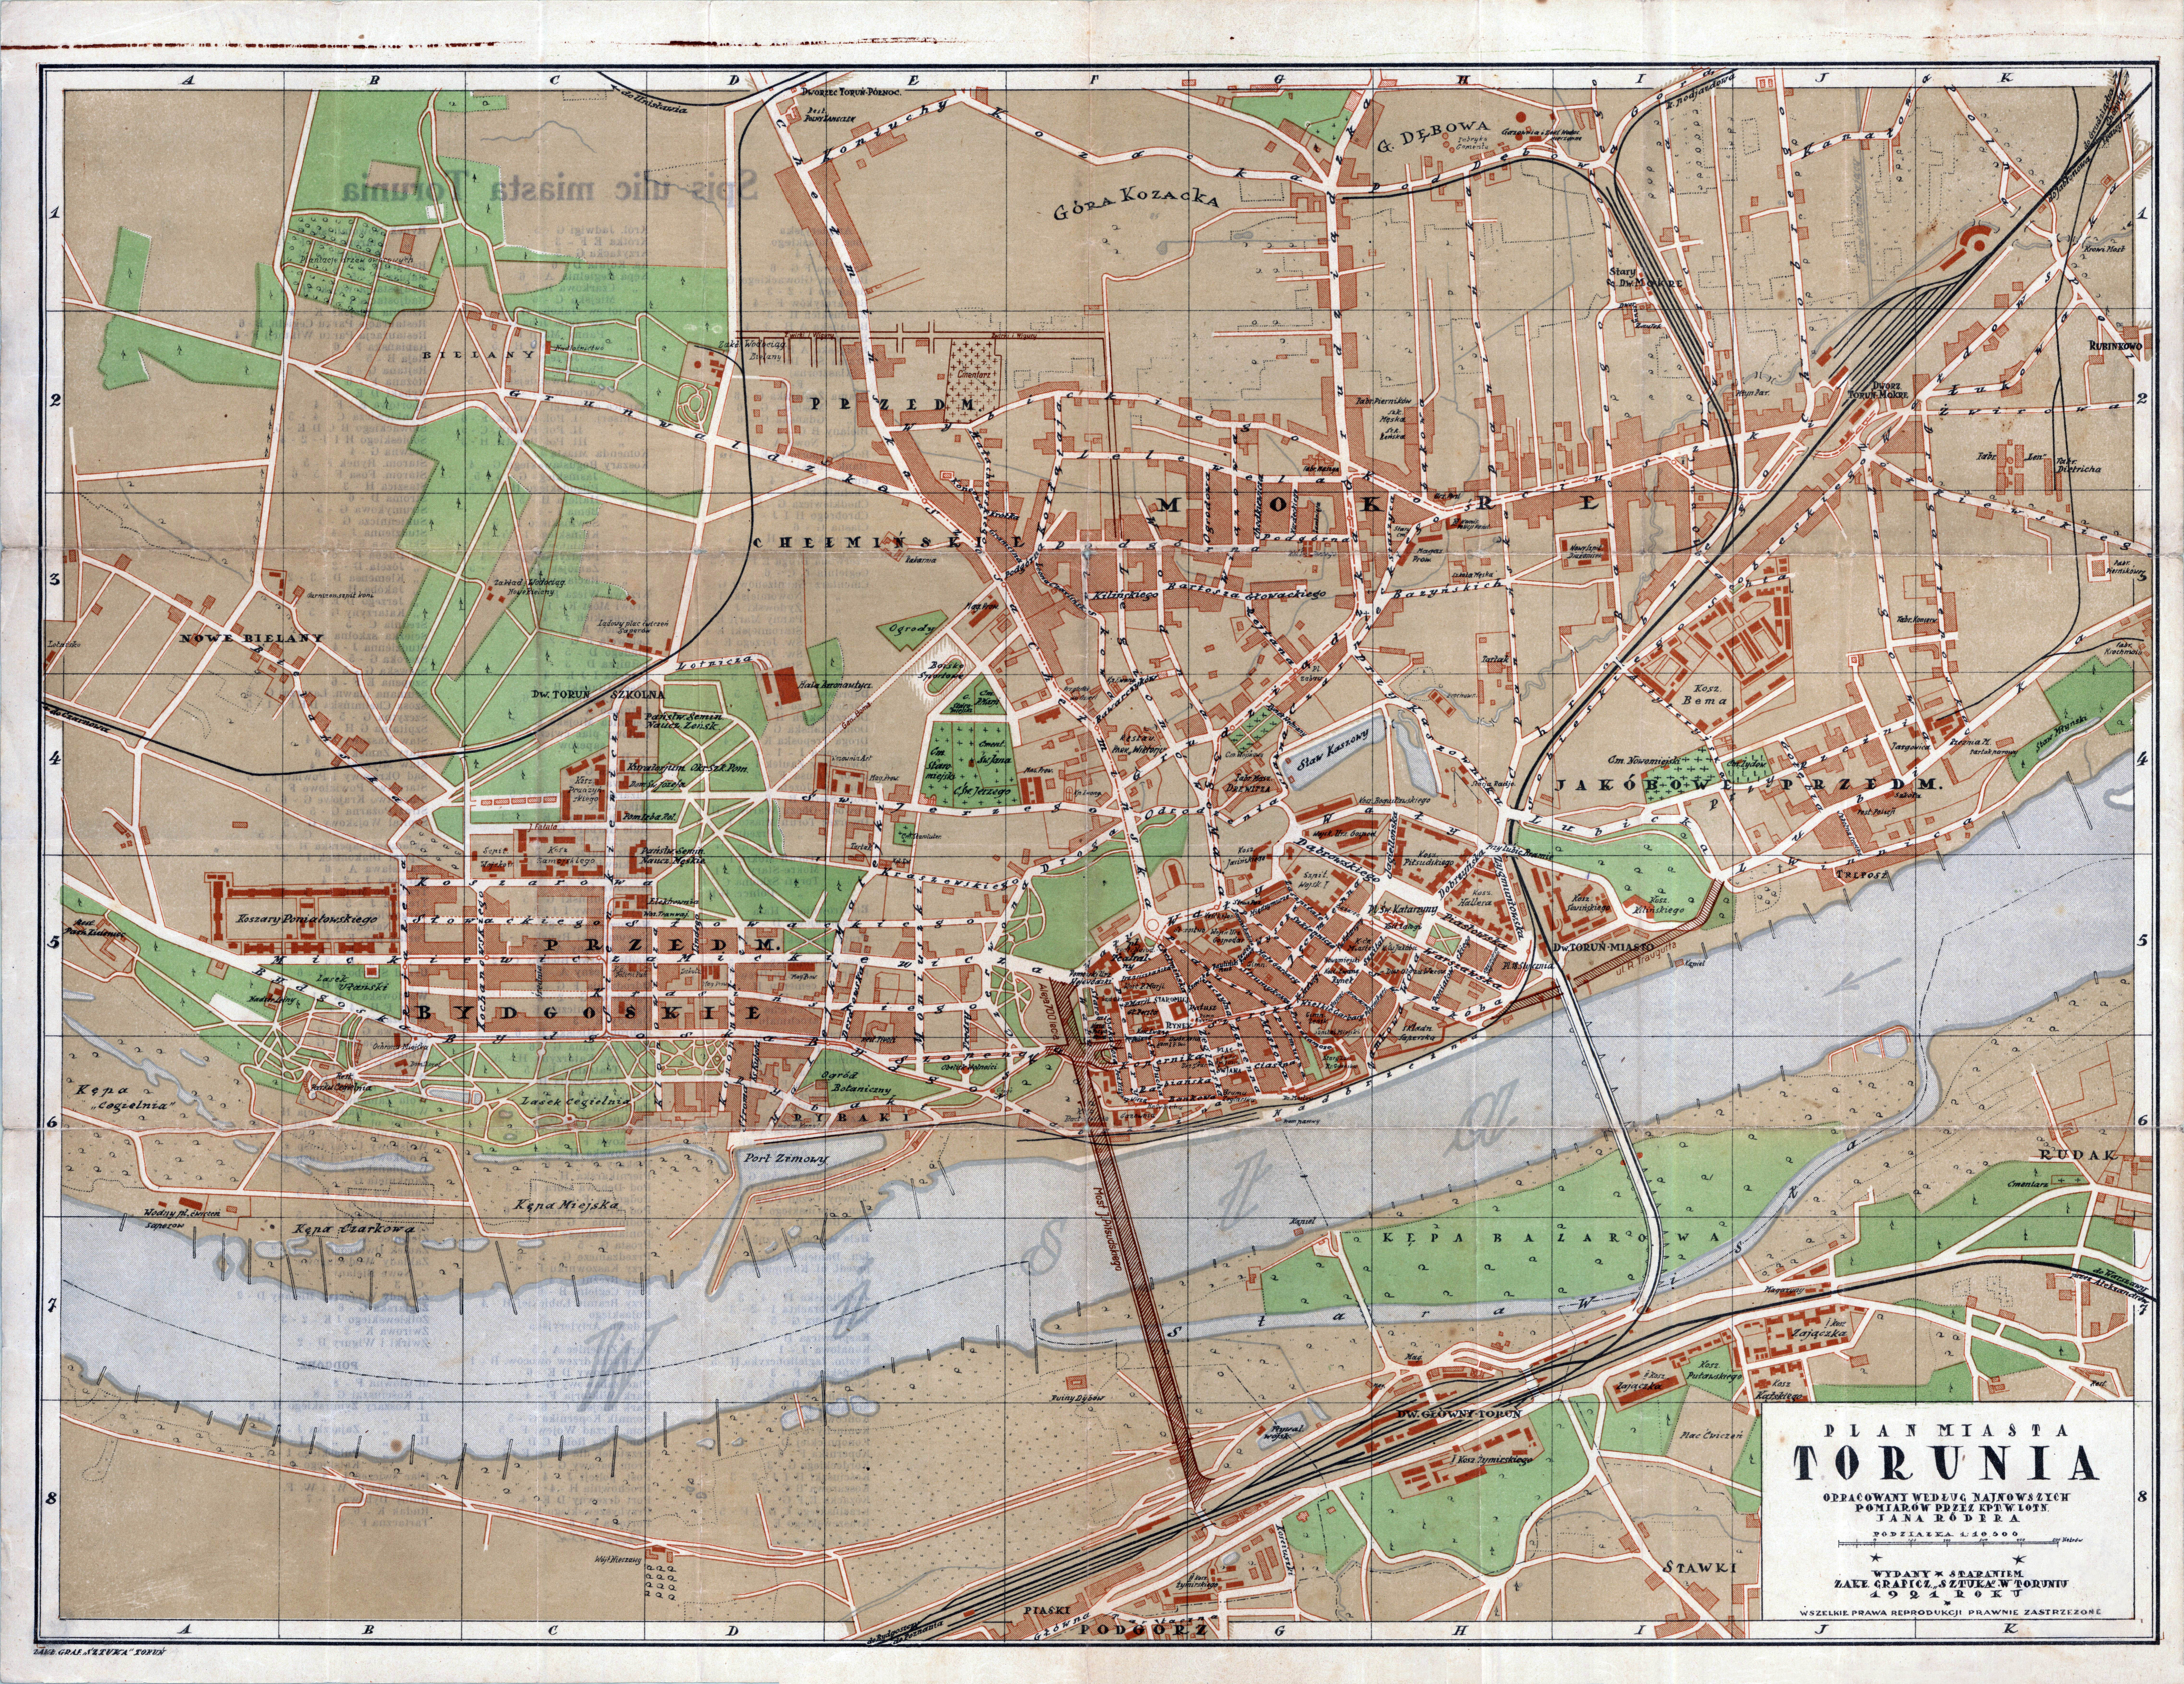 FileMap of Torun 1921jpg Wikimedia Commons